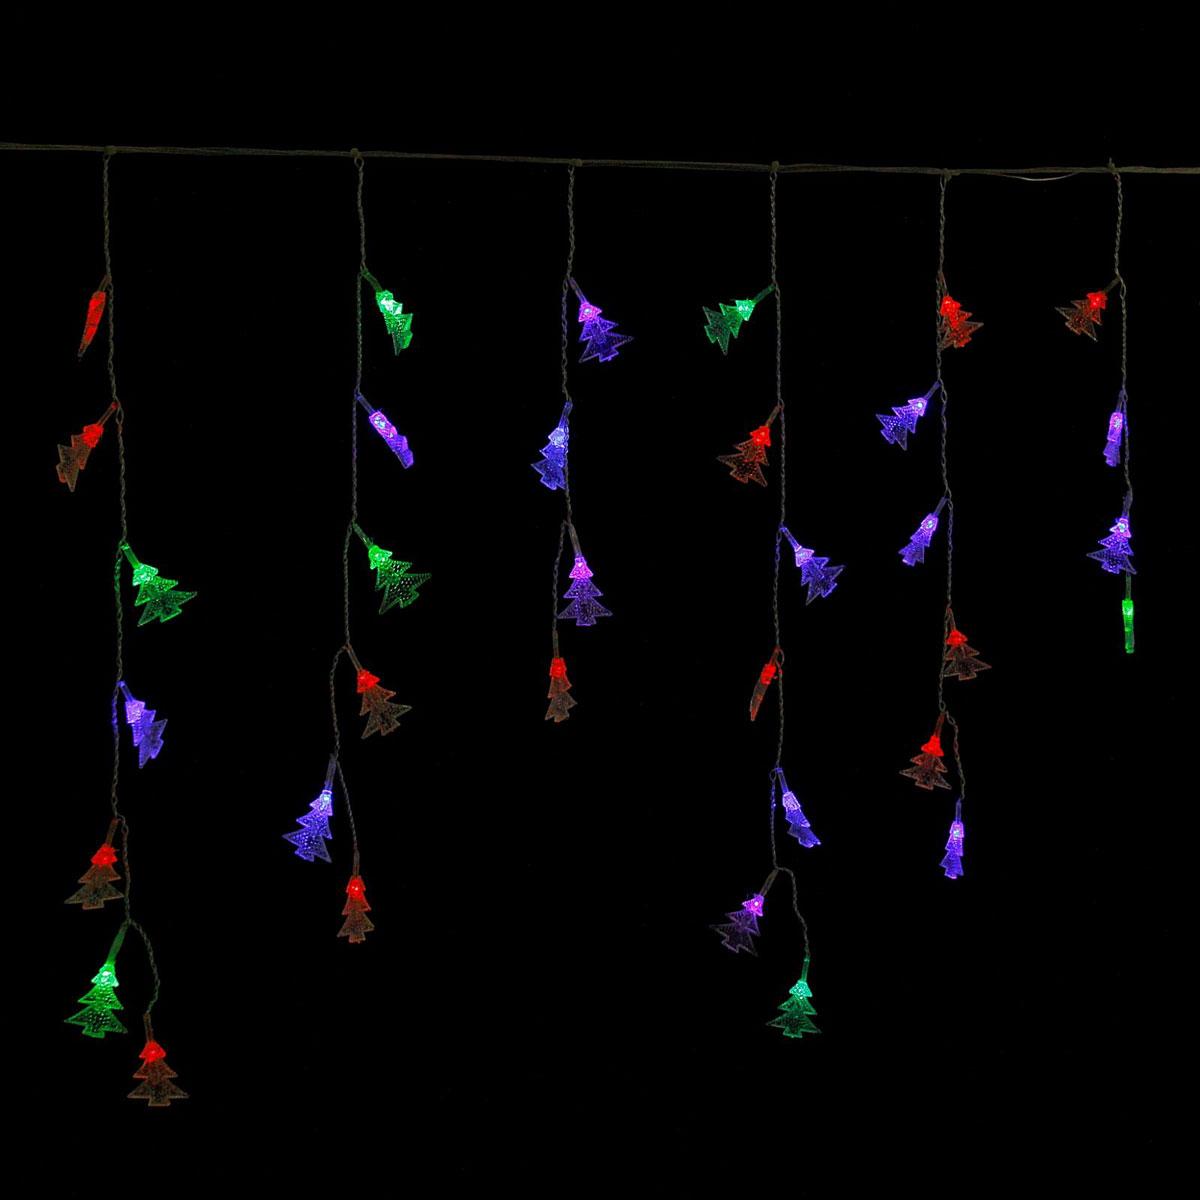 Гирлянда светодиодная Luazon Бахрома. Елки, 100 ламп, 220 V, цвет: мультиколор, 2,8 х 0,6 м. 671644 гирлянда luazon дождь 2m 6m multicolor 671678